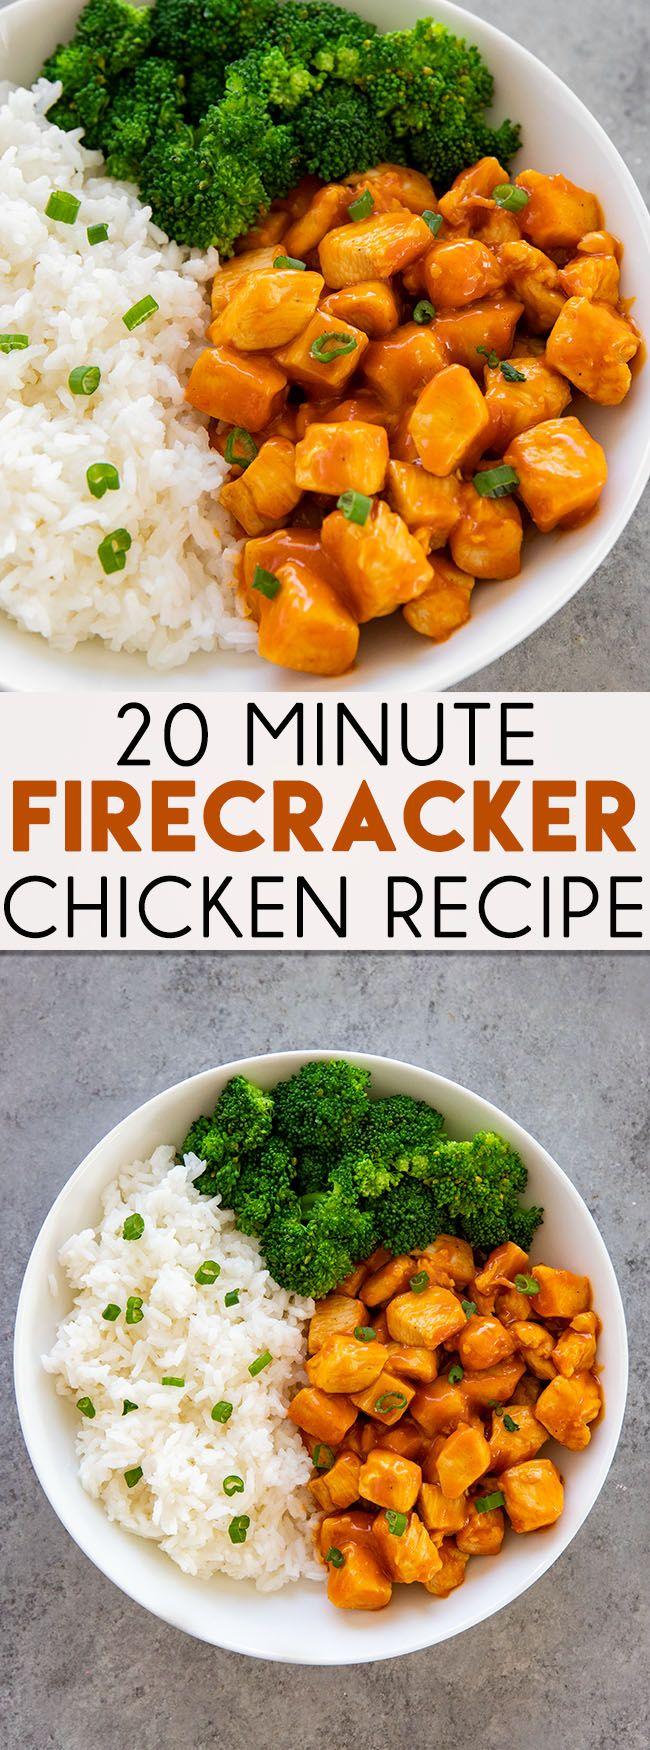 20 Minute Firecracker Chicken images